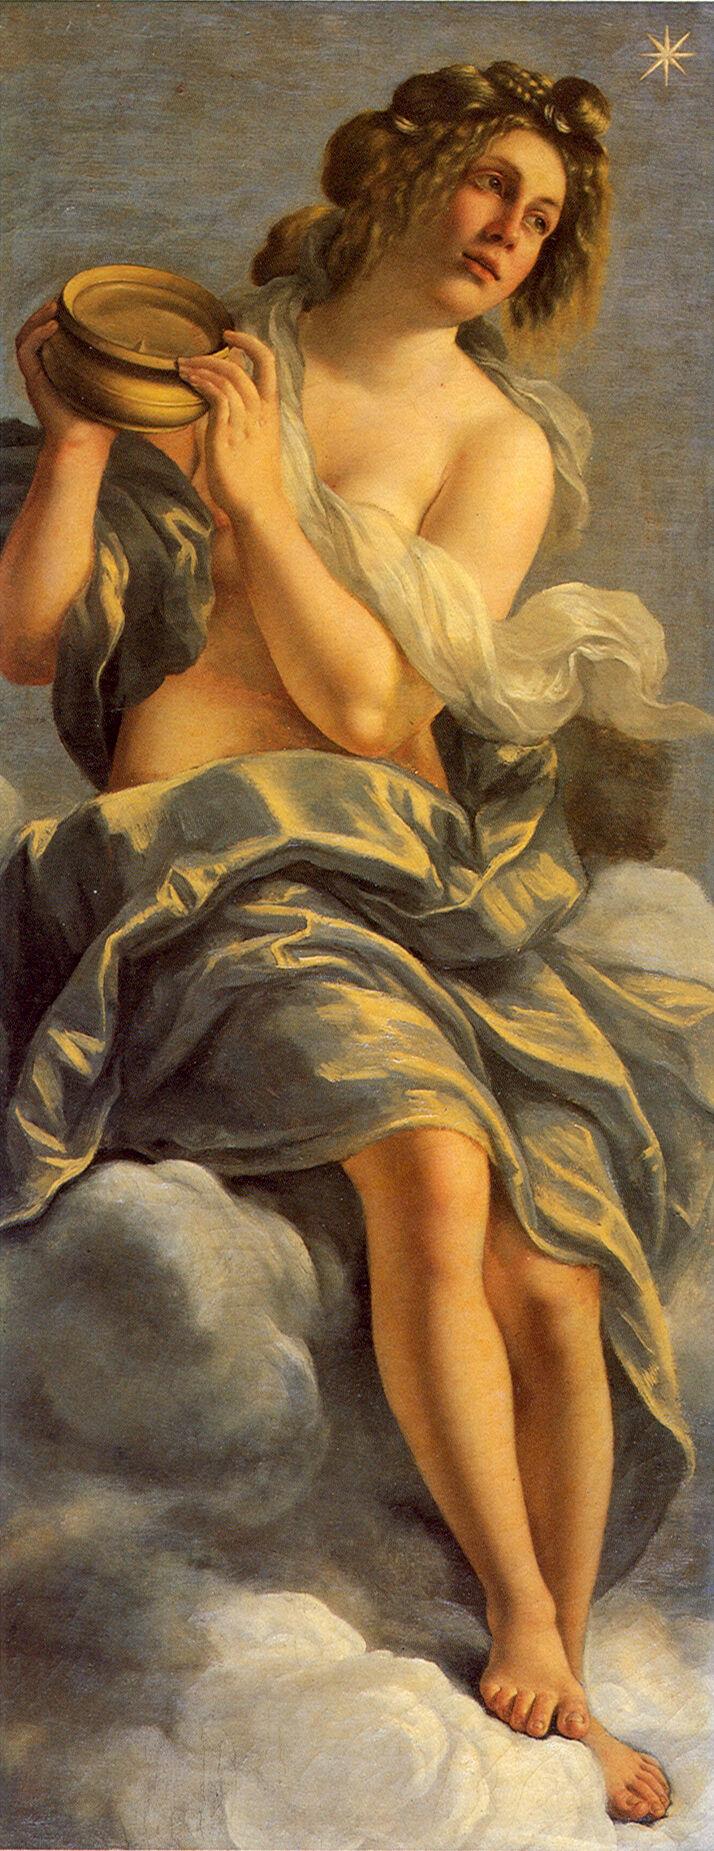 Artemisia Gentileschi, Allegory of Inclination, ca. 1615. Photo via Wikimedia Commons.